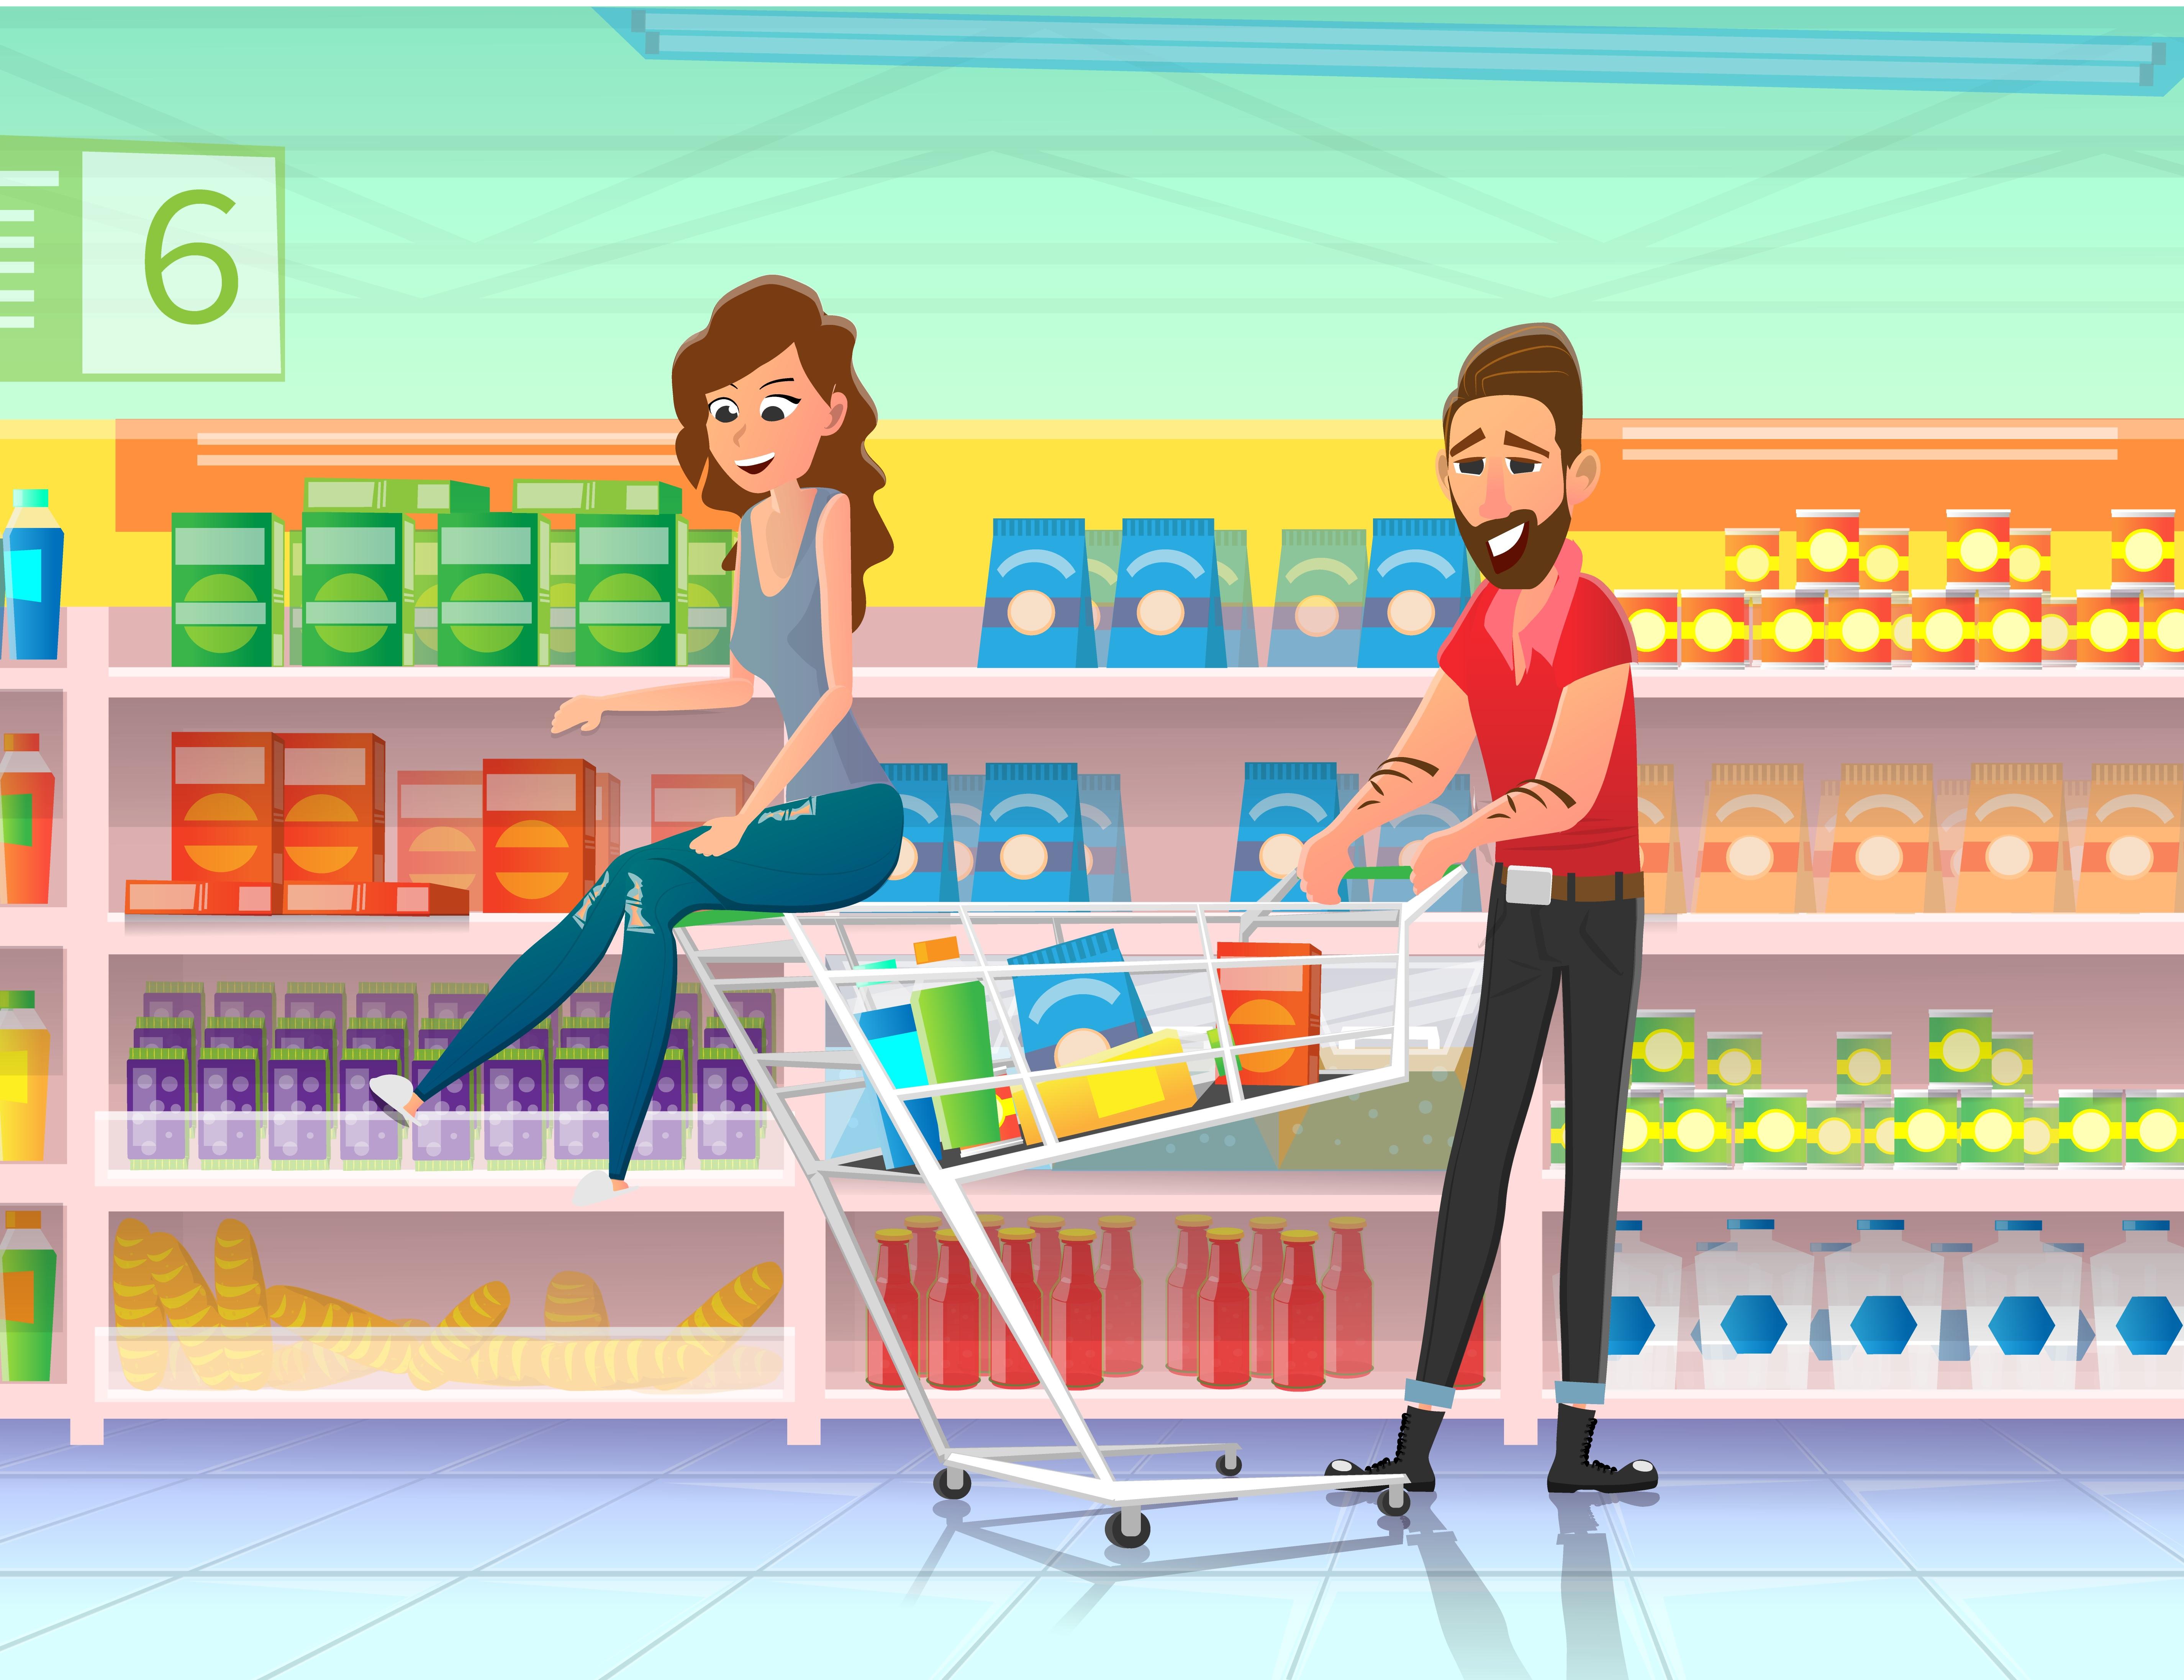 Groceryshop Event Reveals a Rejuvenated Retail Vertical